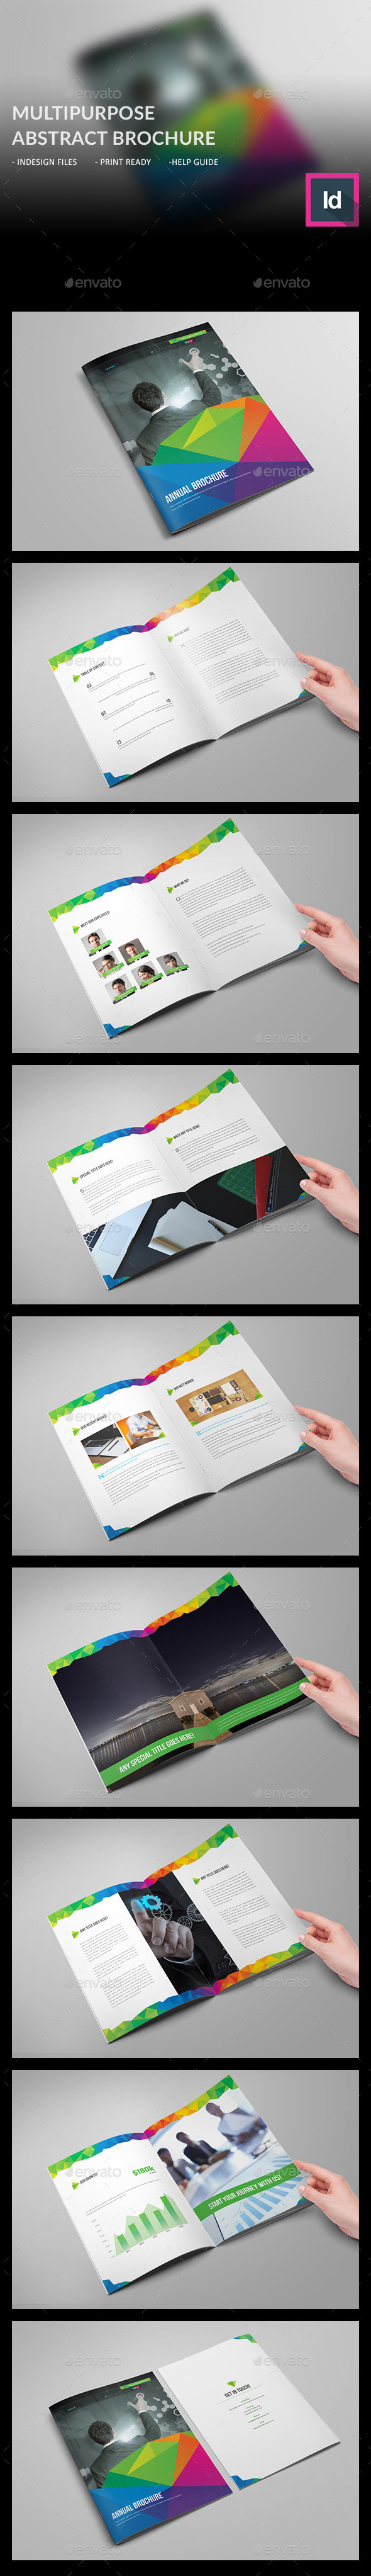 Multipurpose Abstract Brochure - Brochures Print Templates